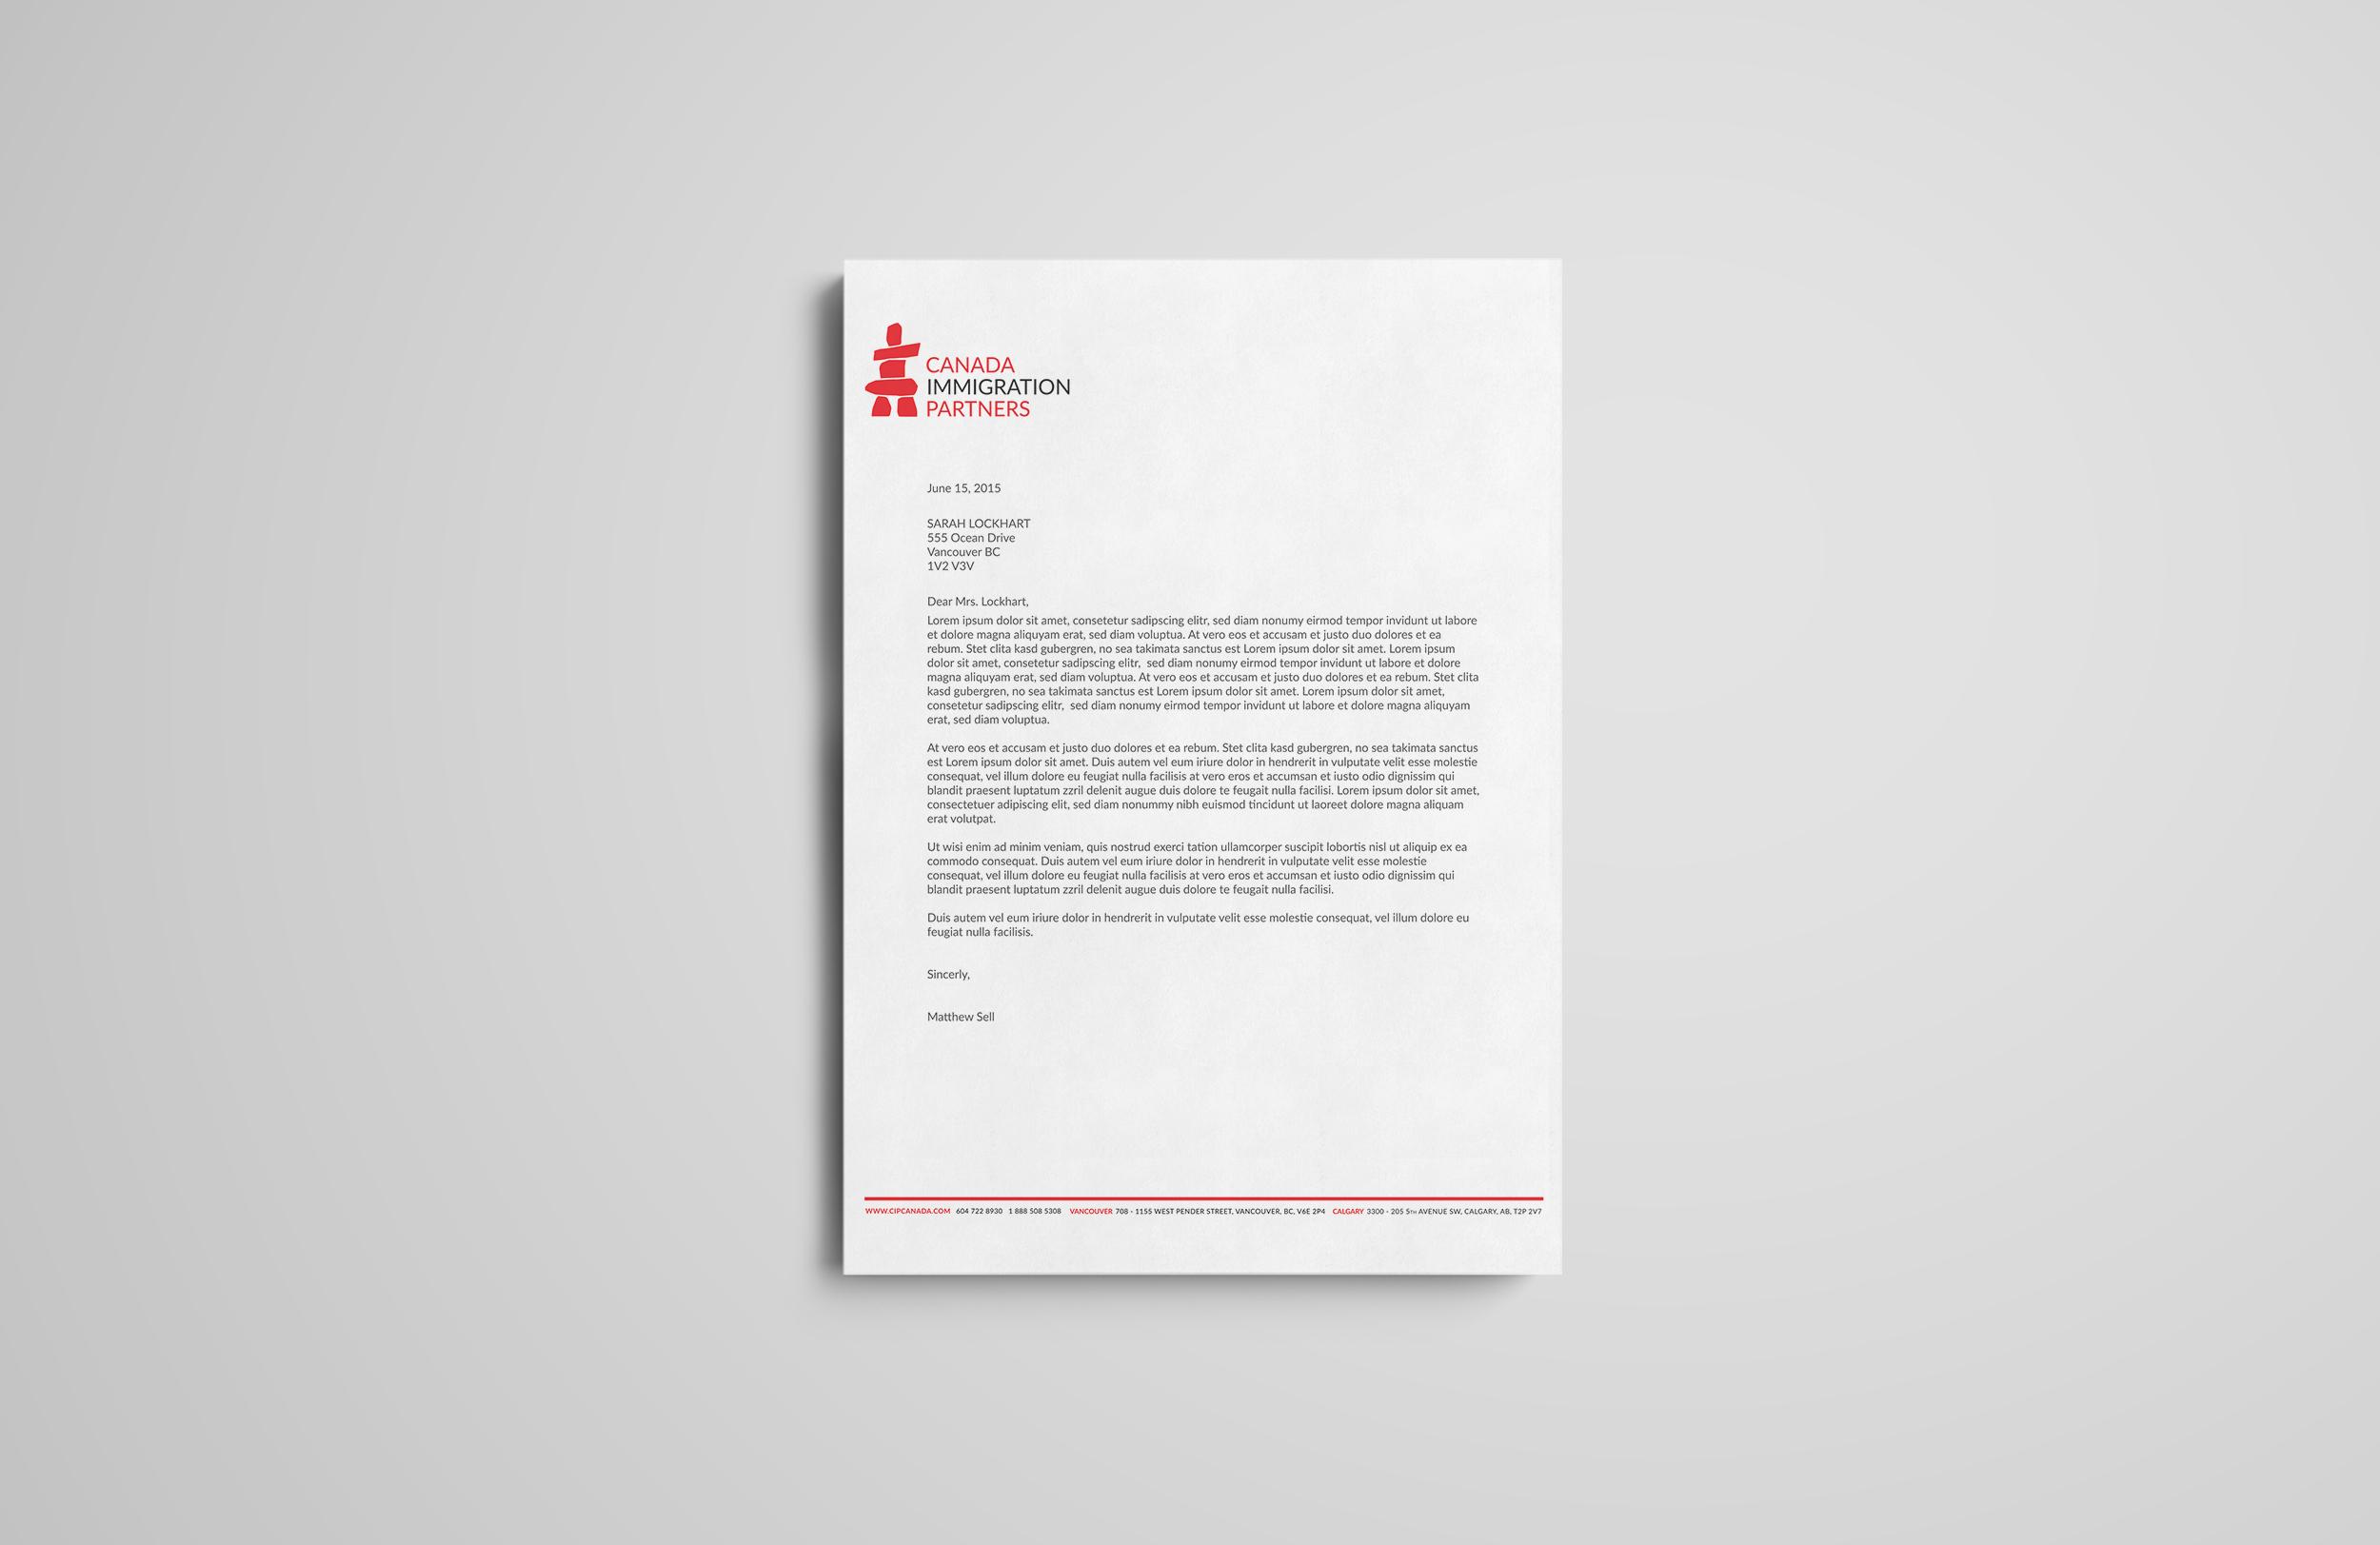 katelynbishop_design_CIP_letterhead1